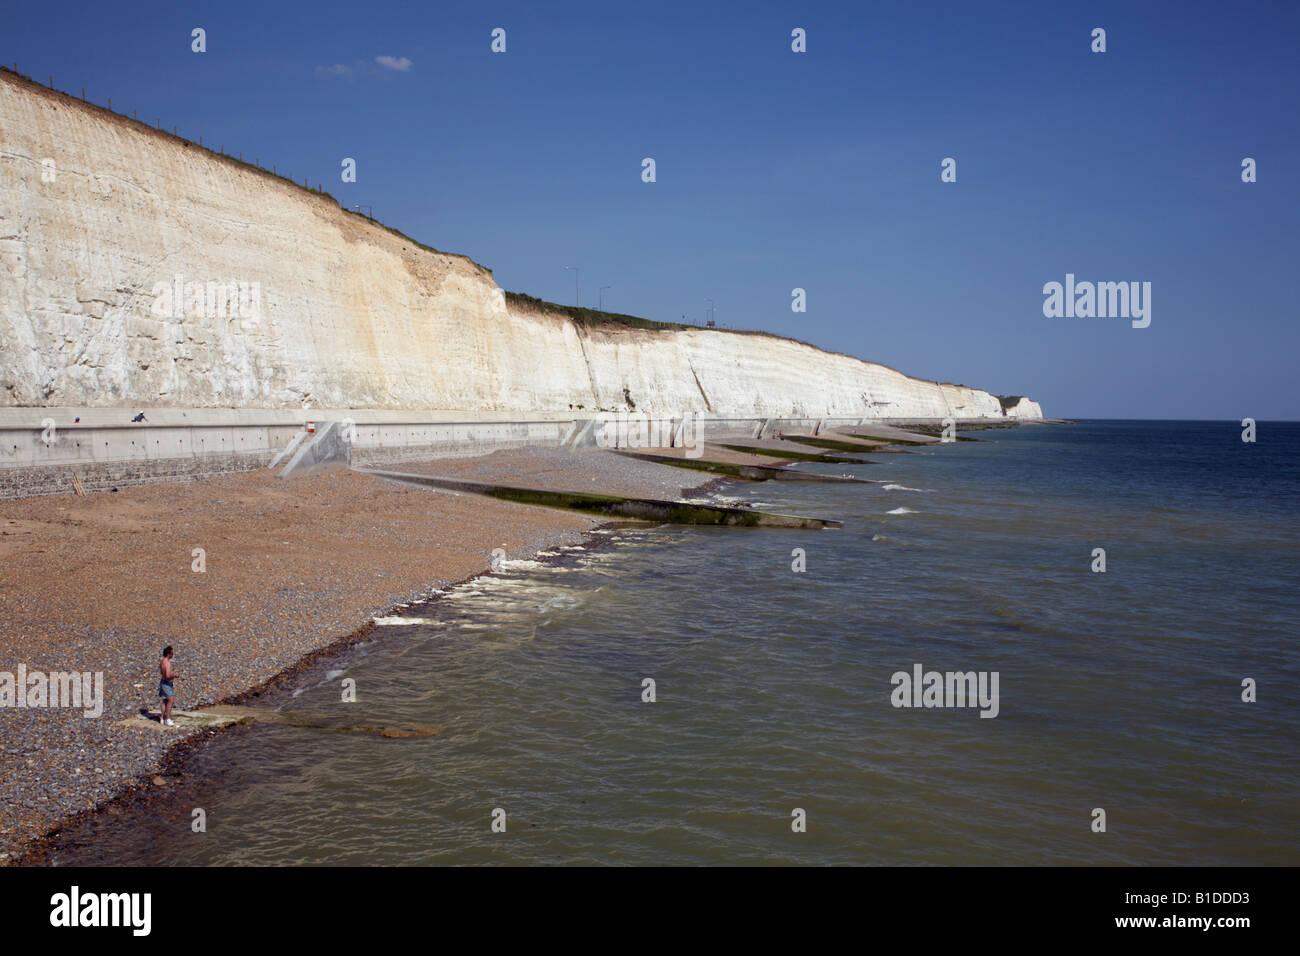 Beaches, Rottingdean, Sussex, England - Stock Image